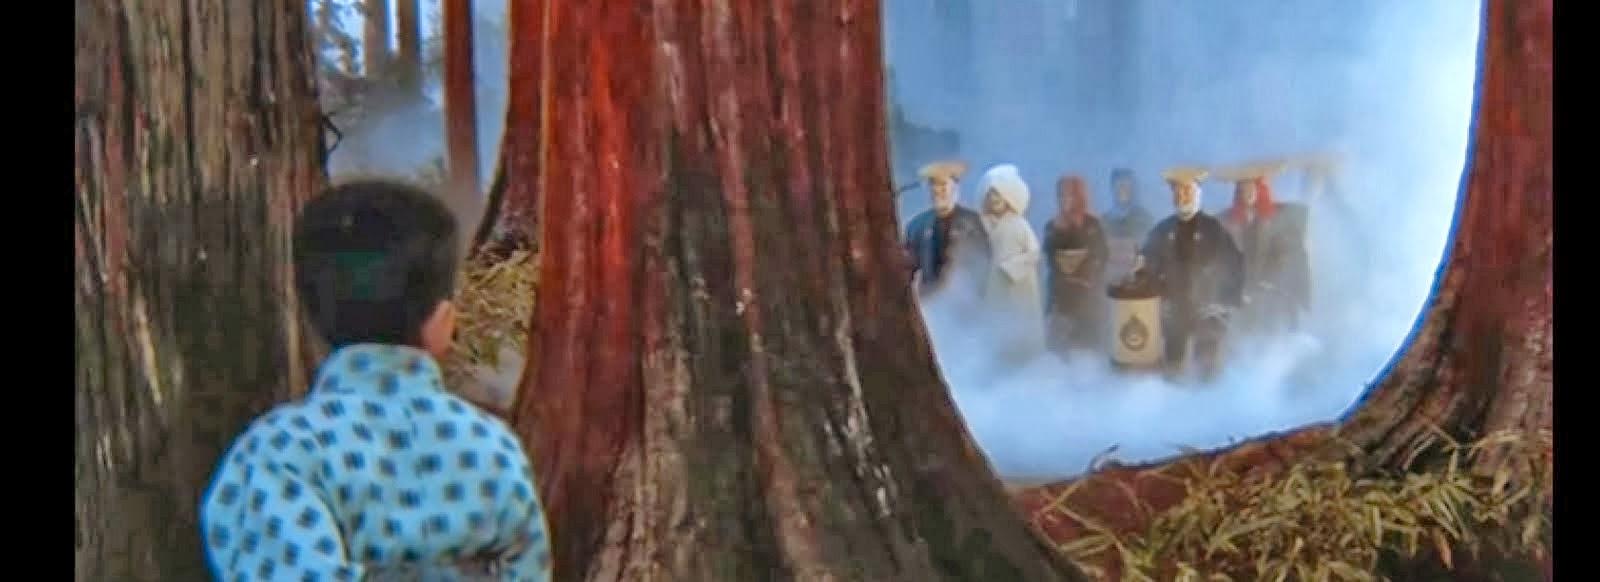 "an analysis of the movie dreams by akira kurosawa Secular apocalypse in akira kurosawa's dreams  as conrad ostwalt says in his analysis of the apocalyptic in film  ""secular apocalypses."